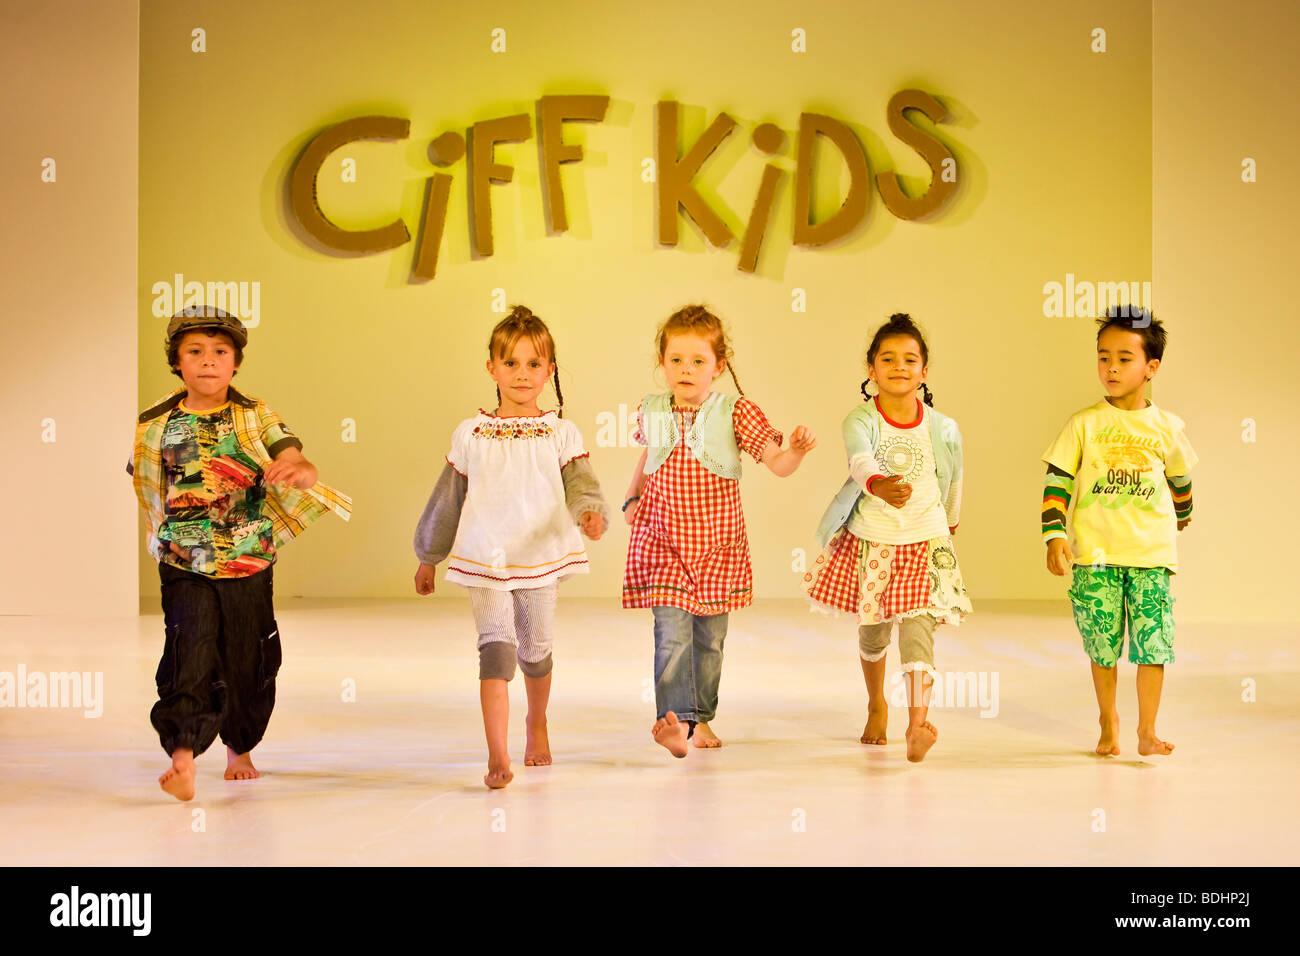 Childrens fashion show - Stock Image